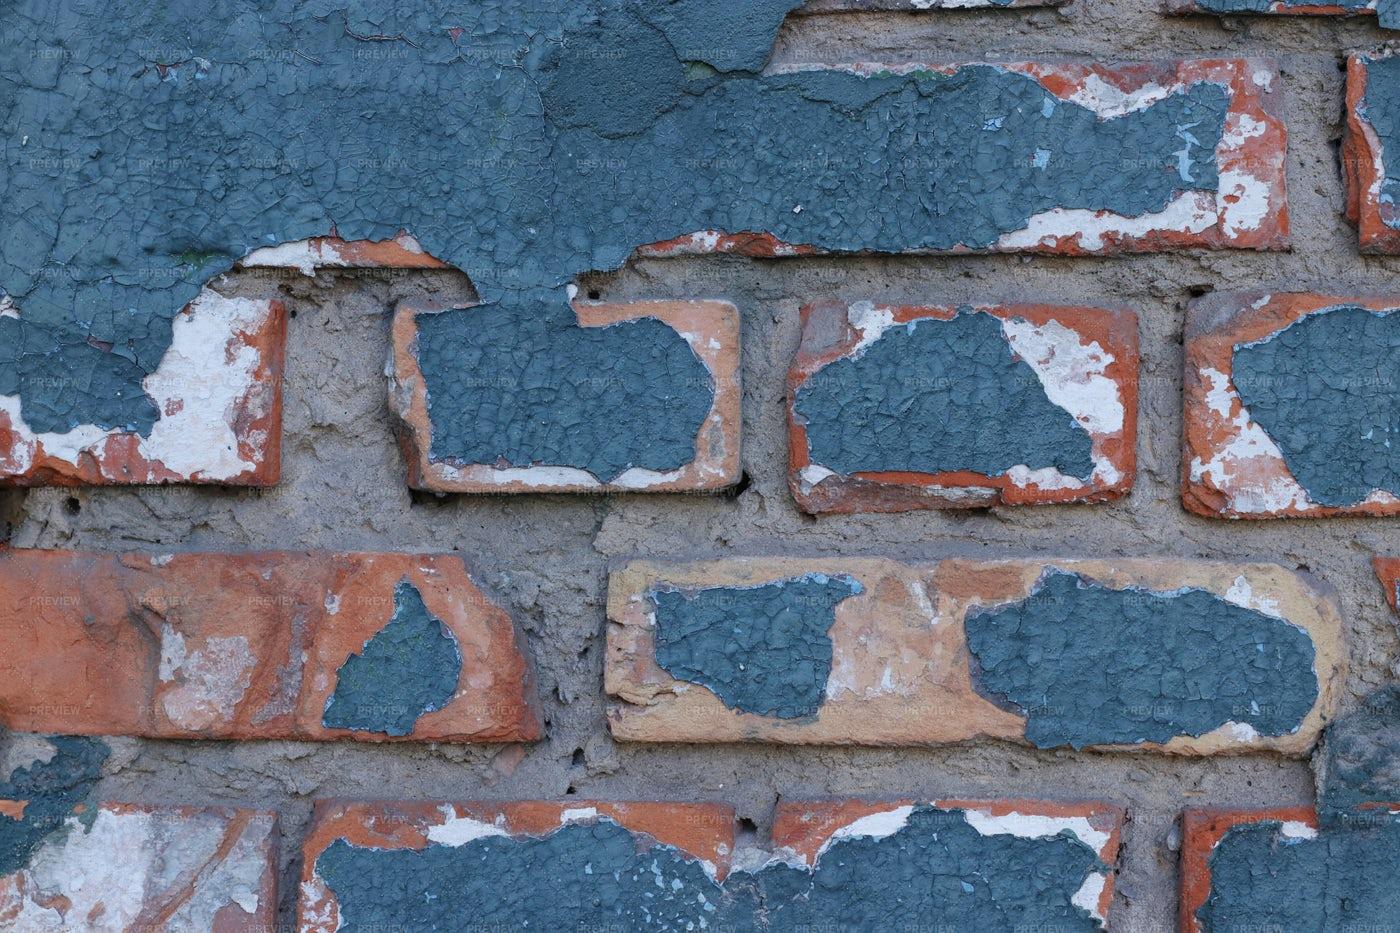 Old Blue Brick Wall: Stock Photos